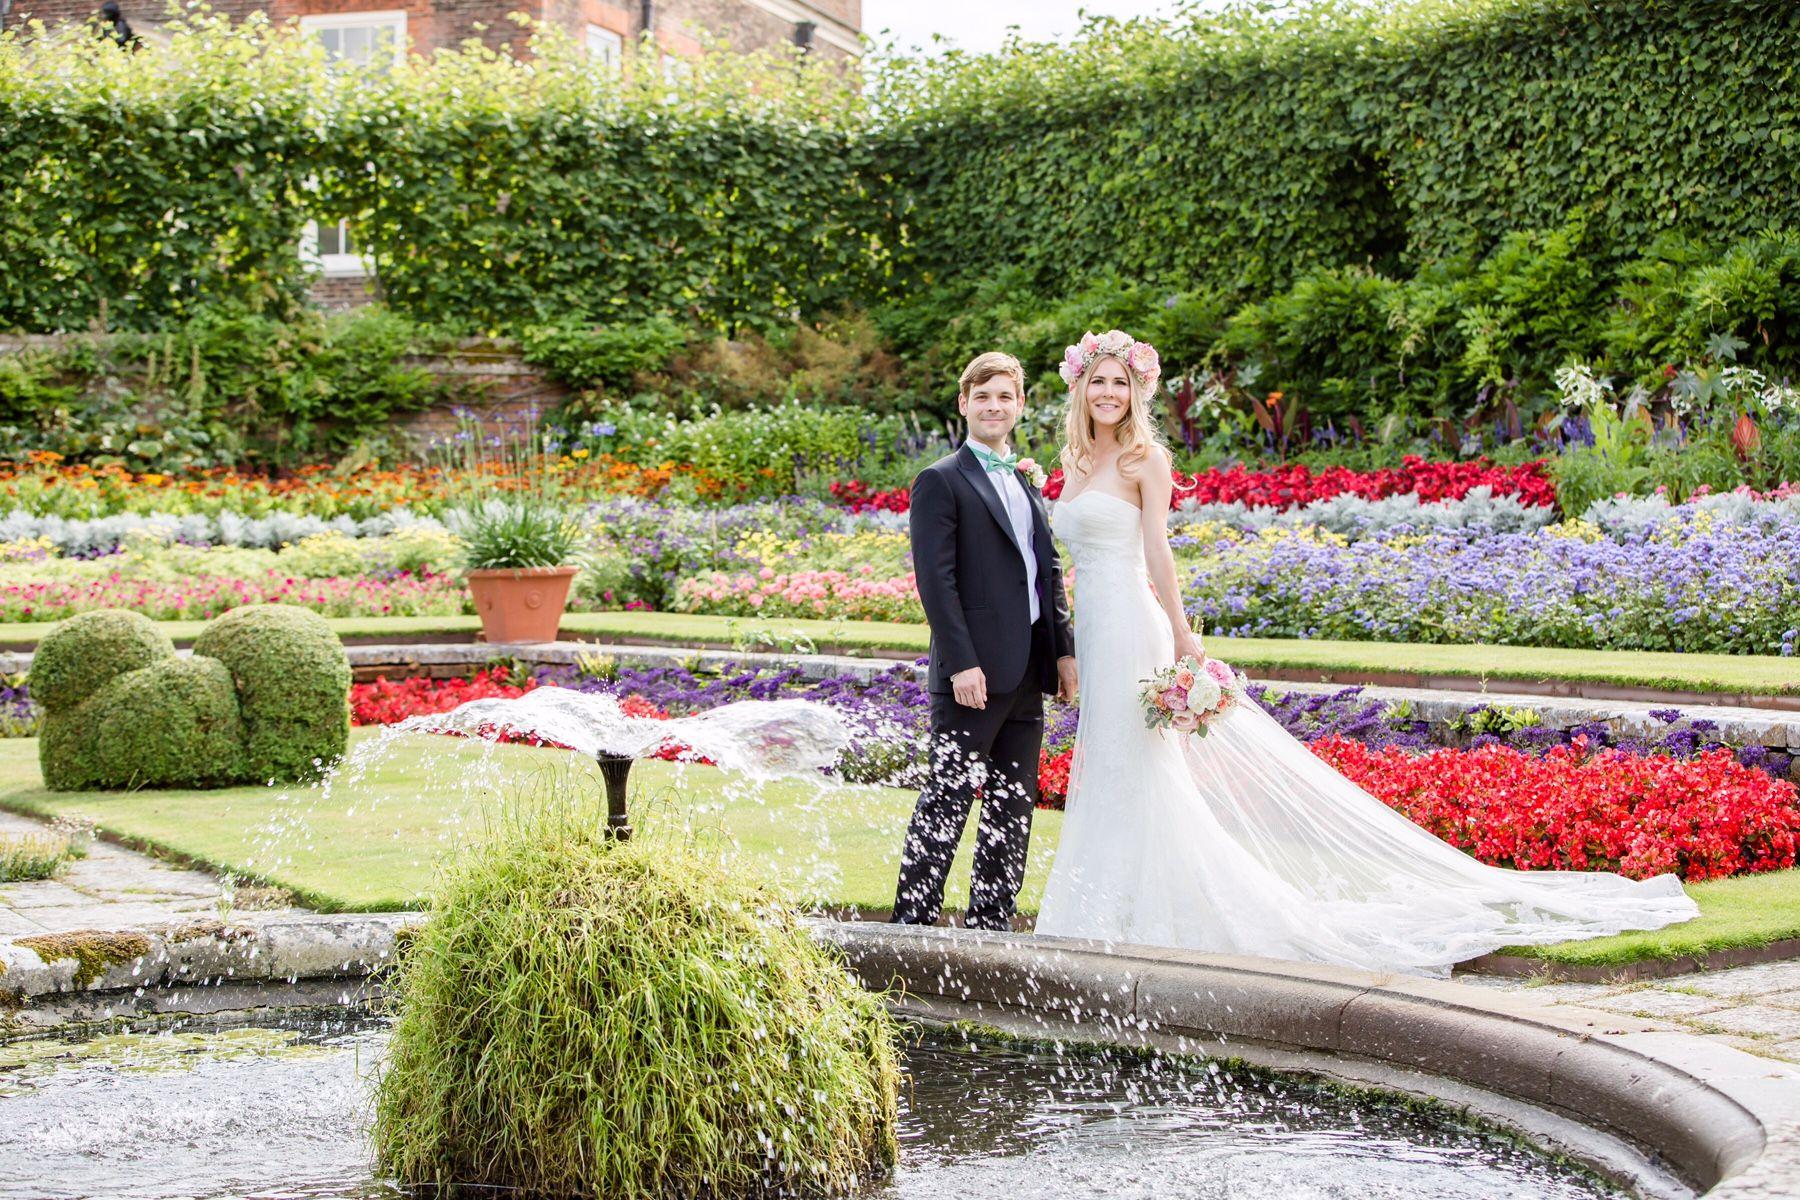 Ami-Elisah-Couture-Wedding-dress-alteration-001